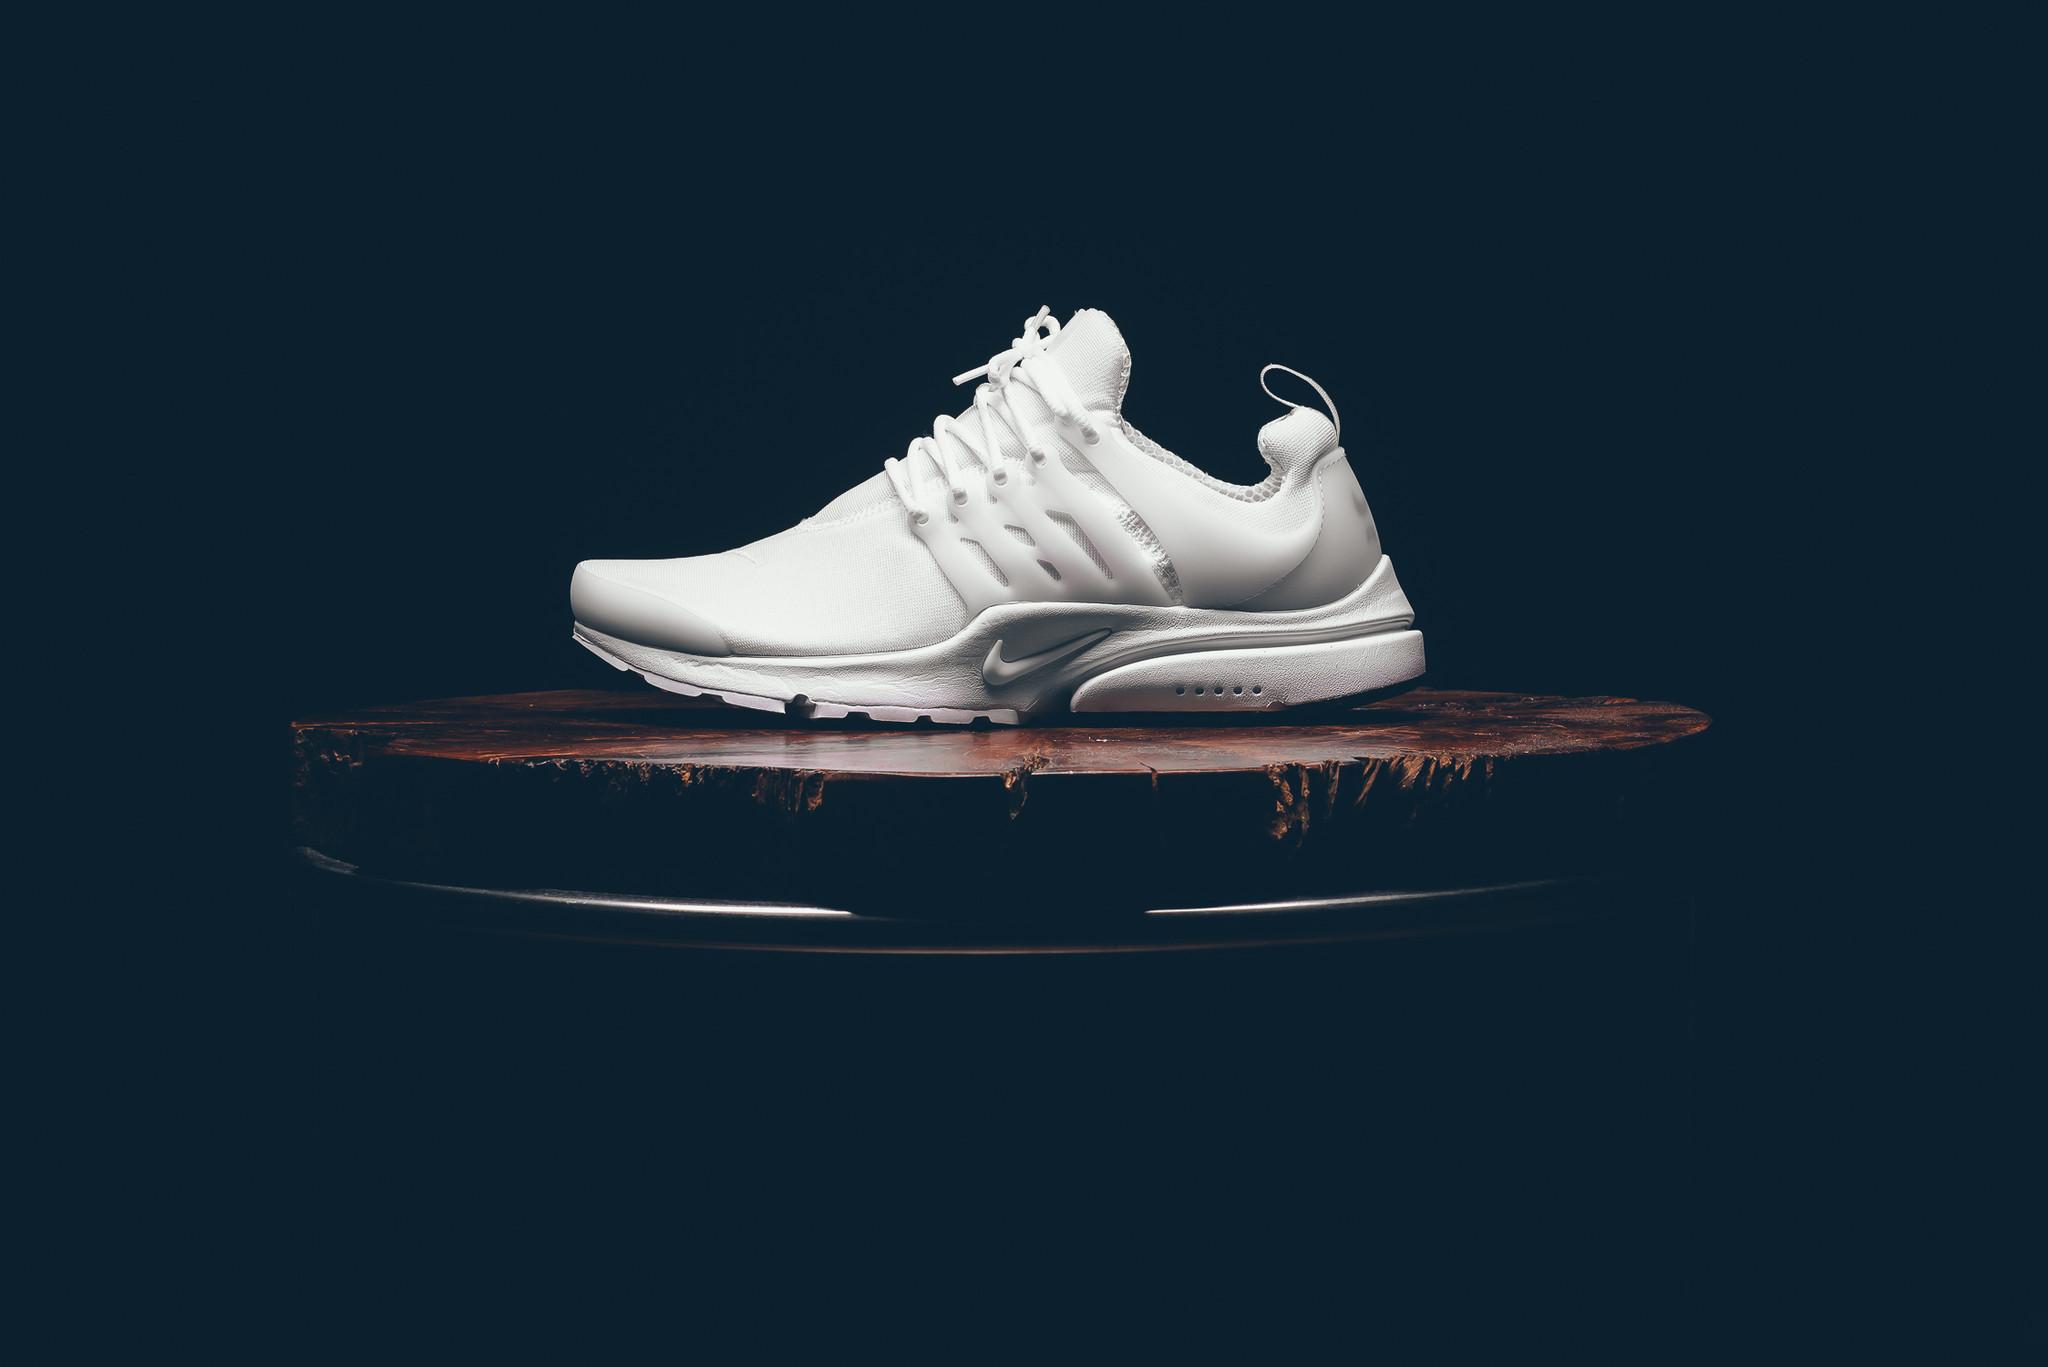 A Nike Air Presto Essential Dressed In All-White • KicksOnFire.com